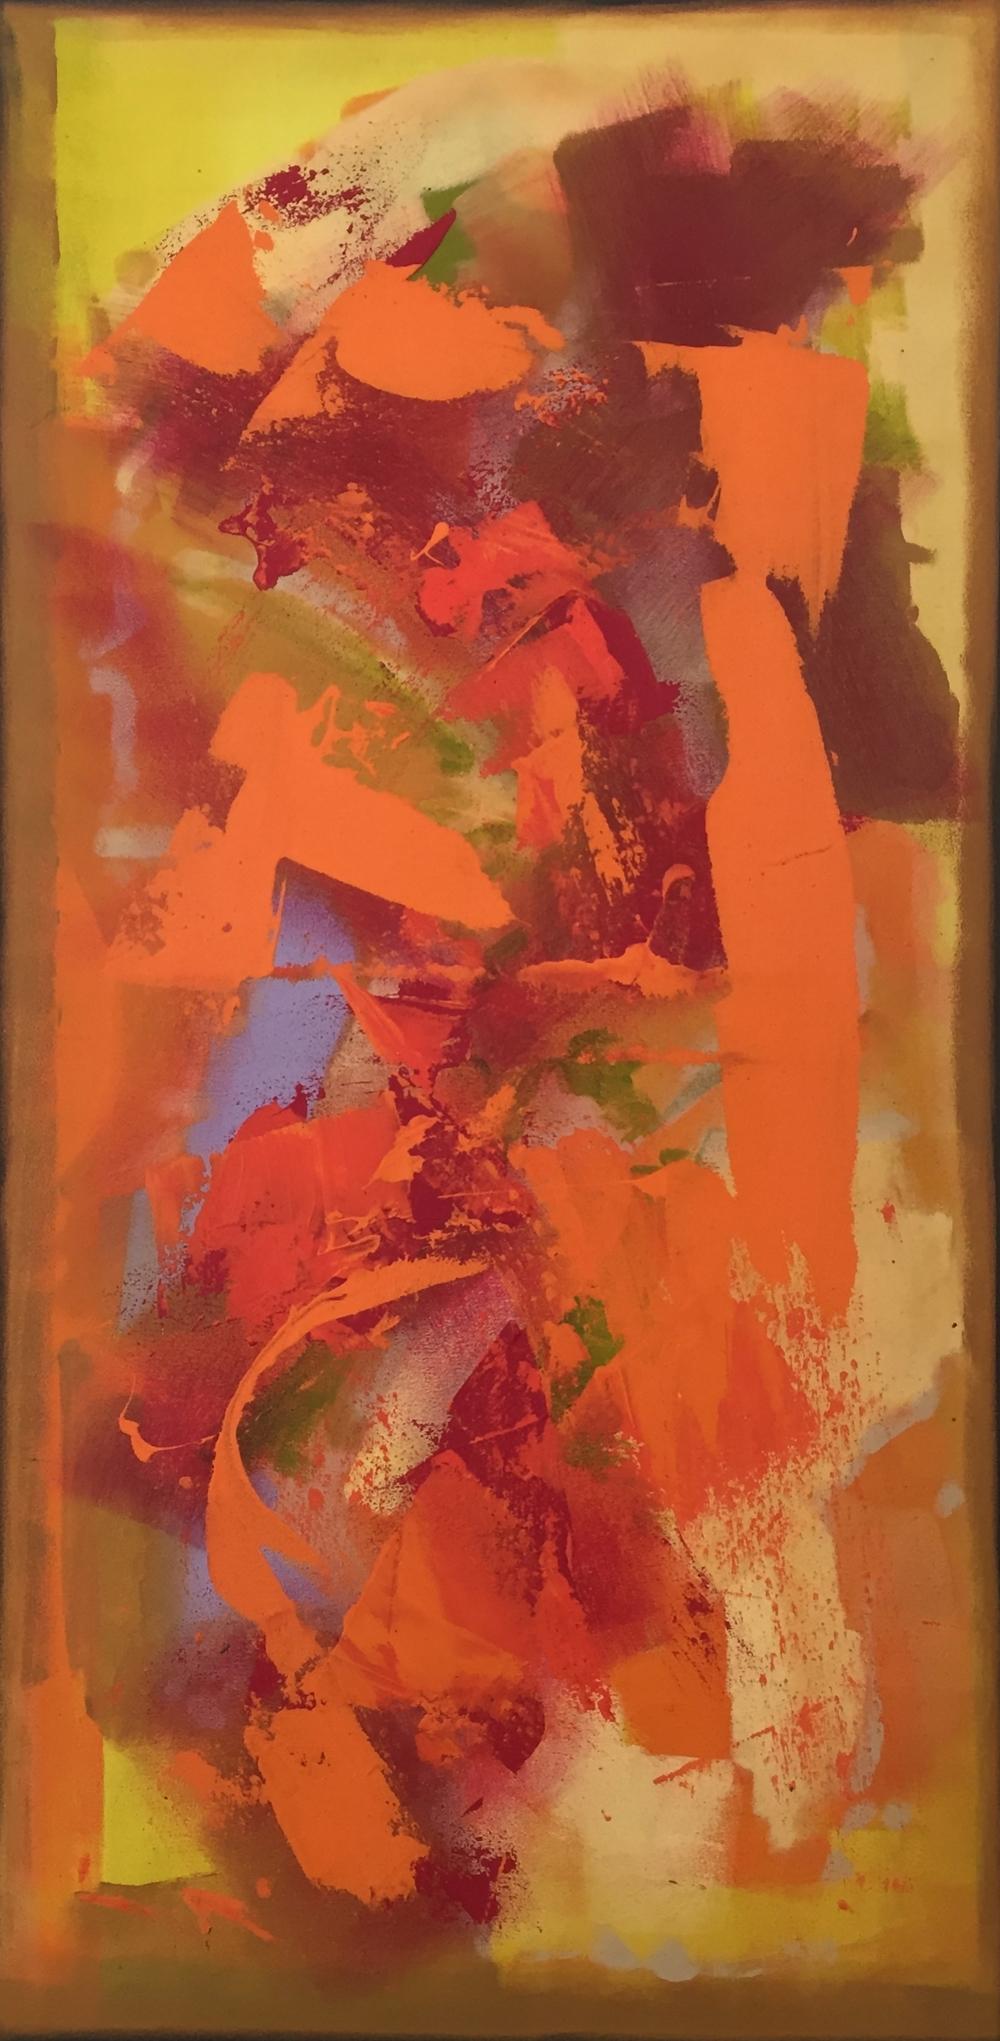 """The Amethyst Woodstar"" (2011), acrylic on canvas, 24"" x 38"""